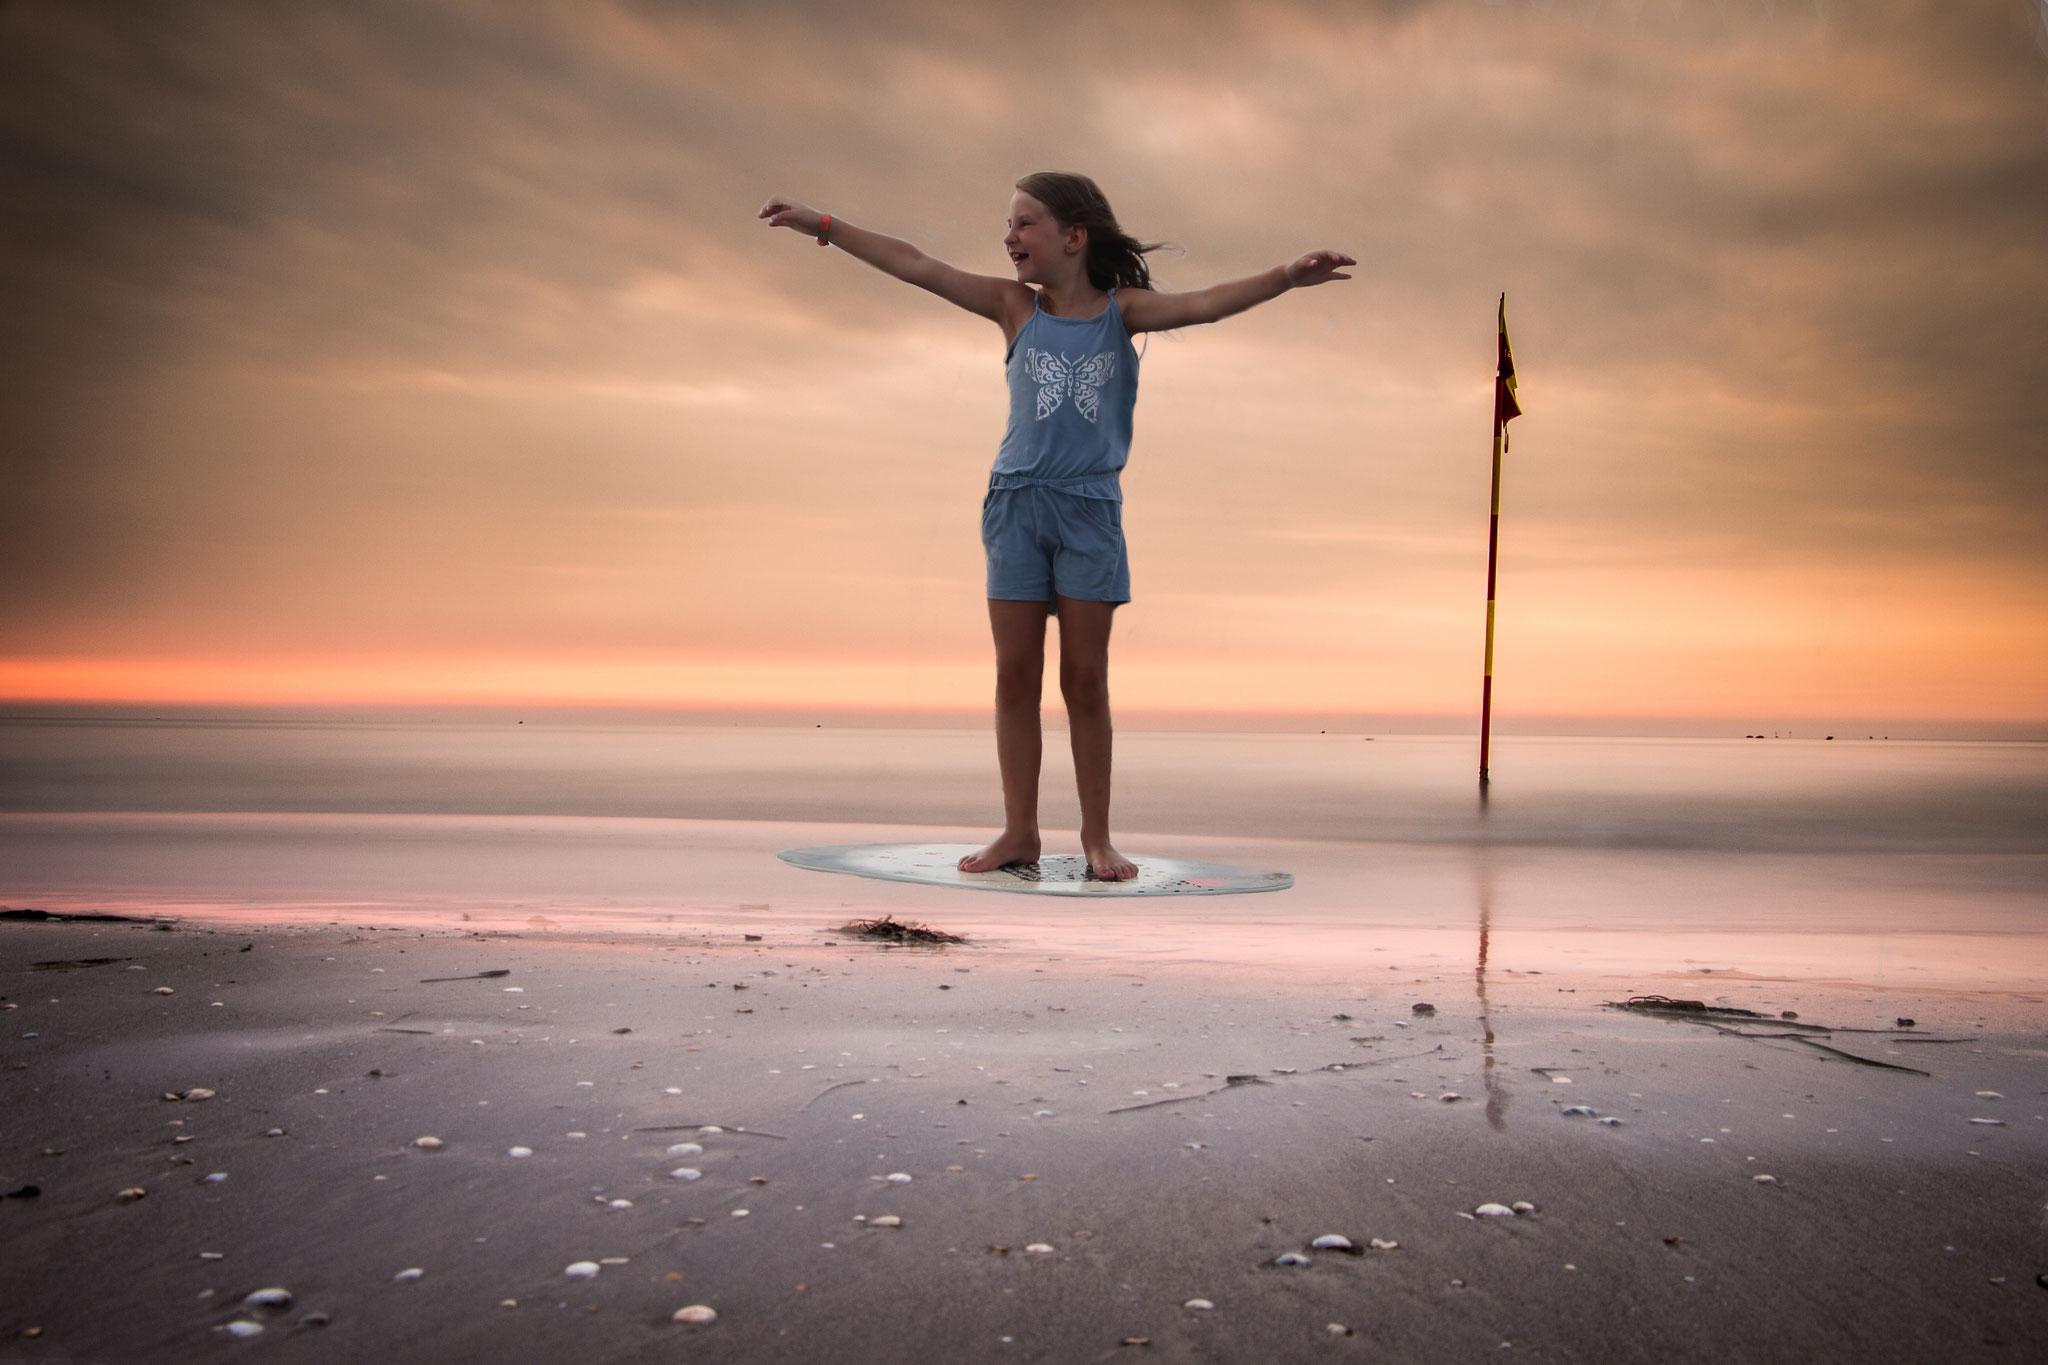 Samia als Surfer